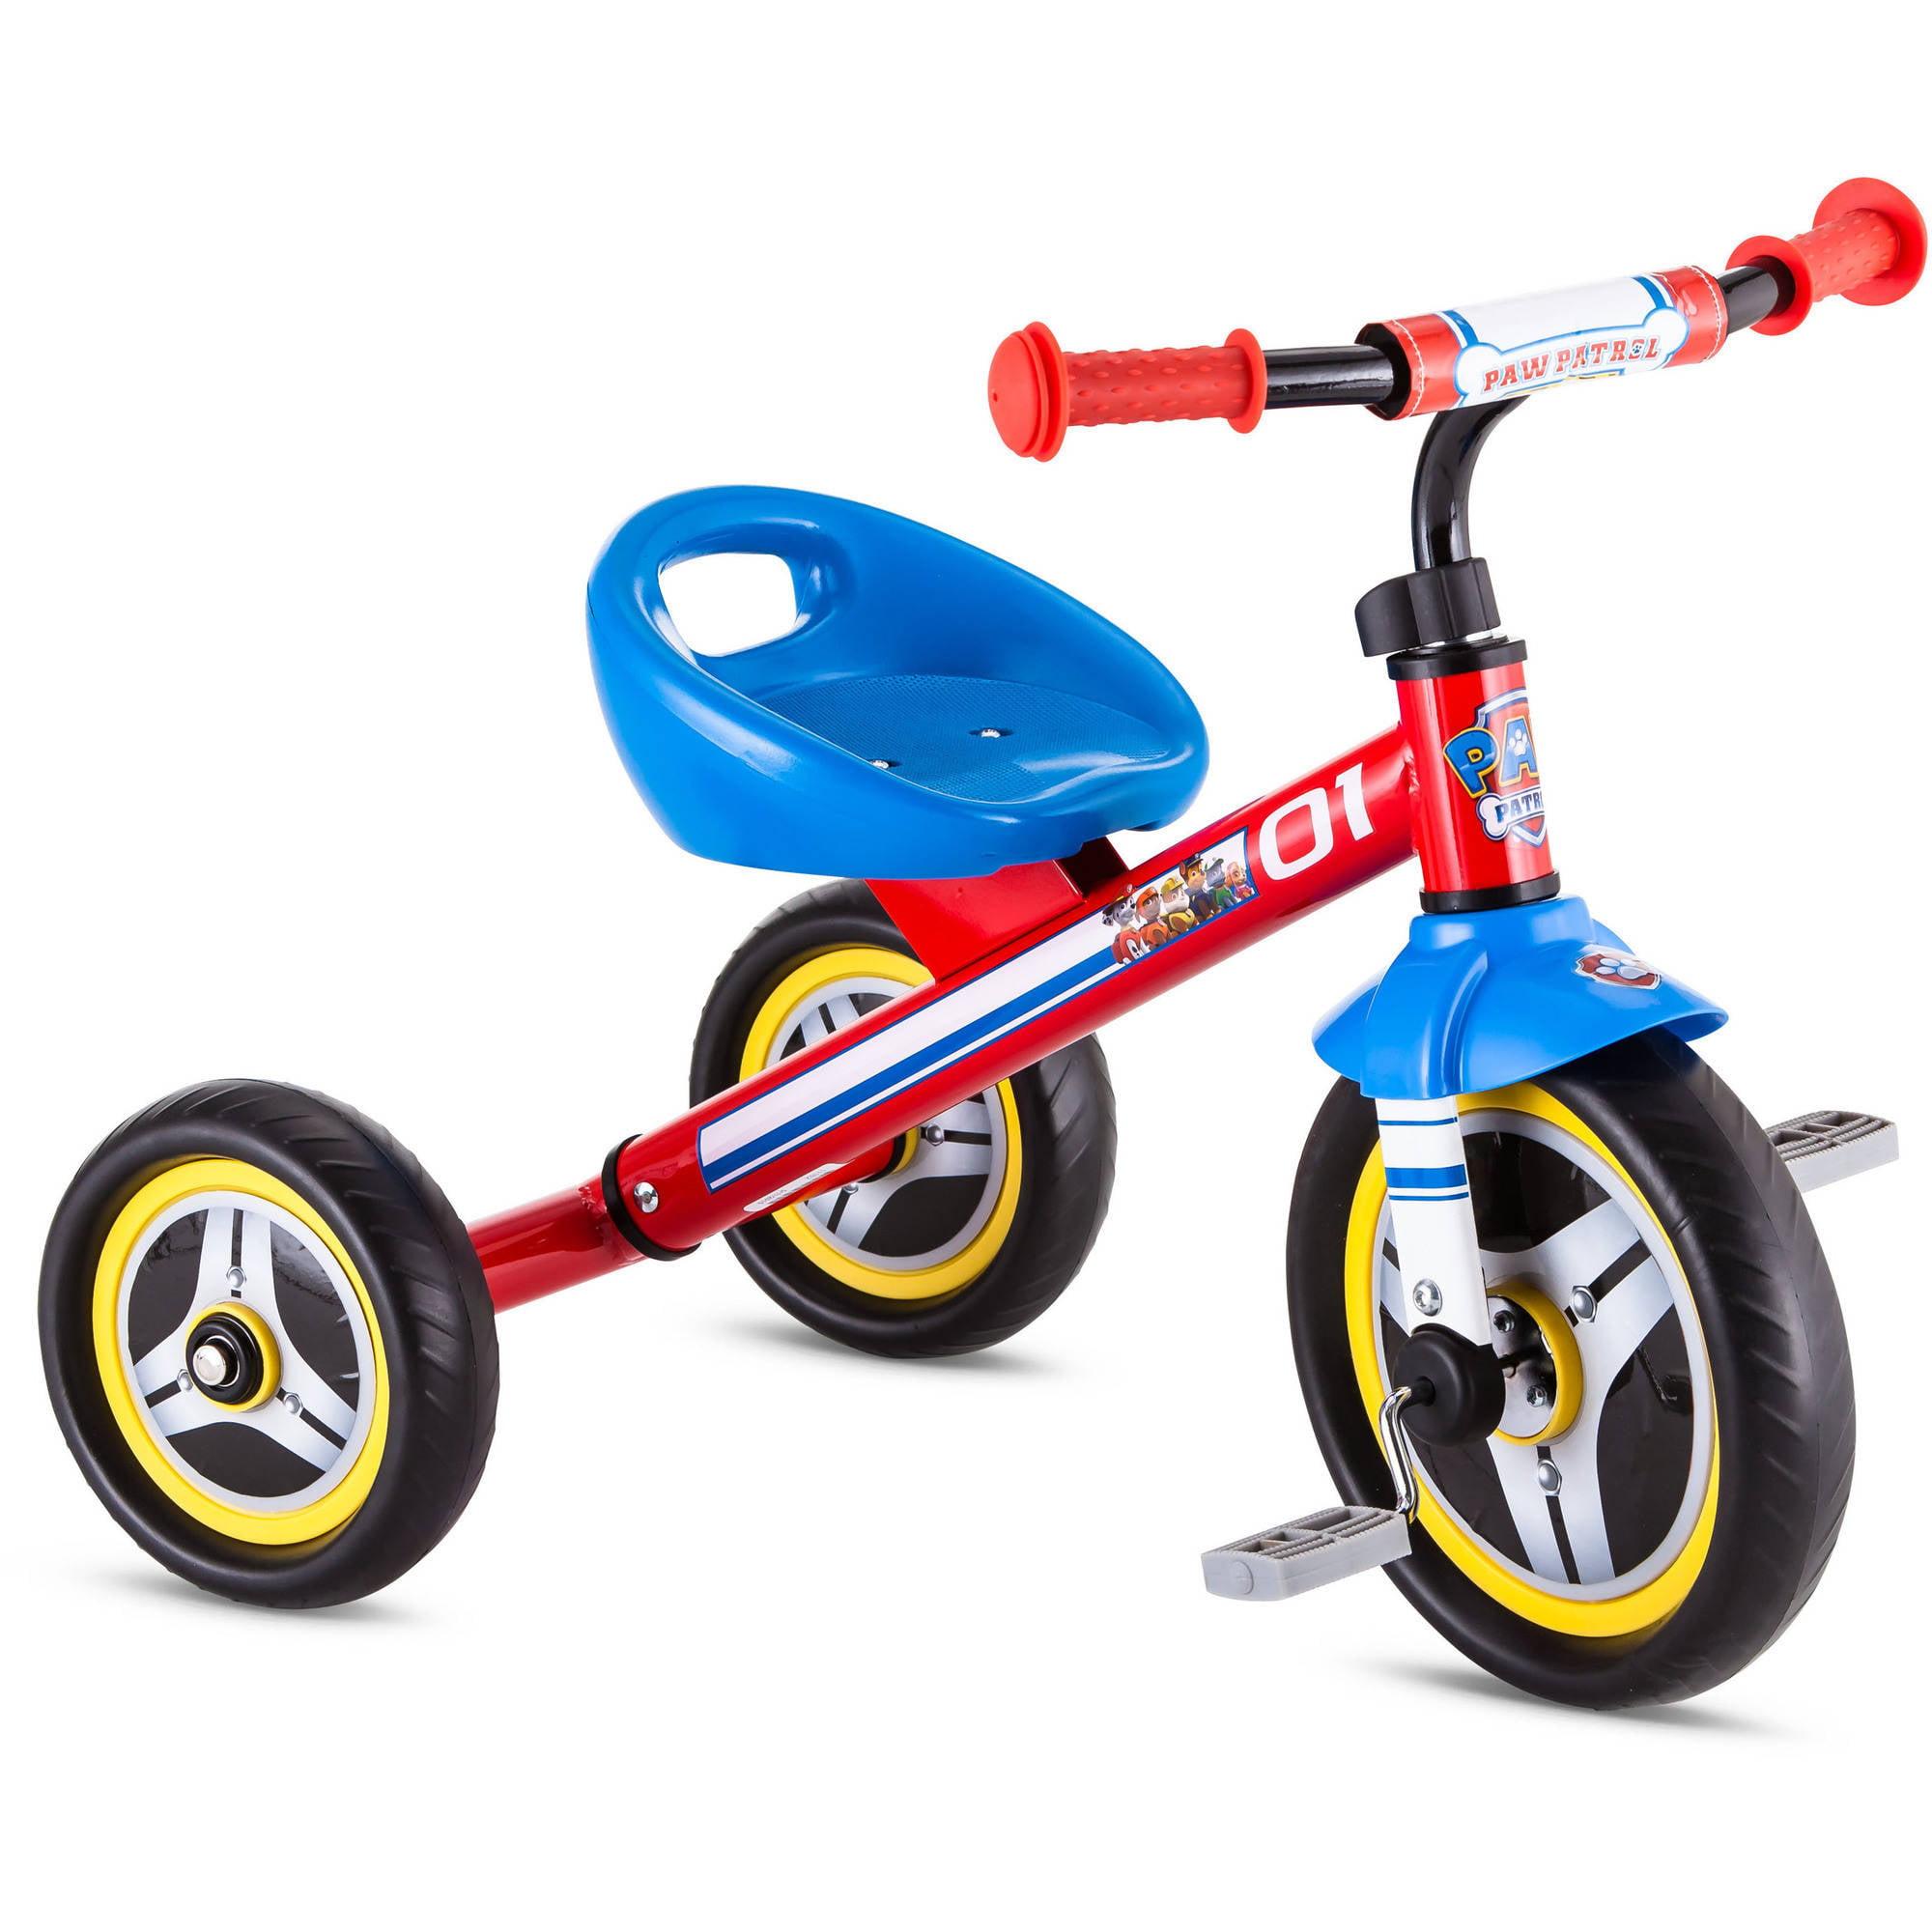 Paw Patrol Ryder Tricycle